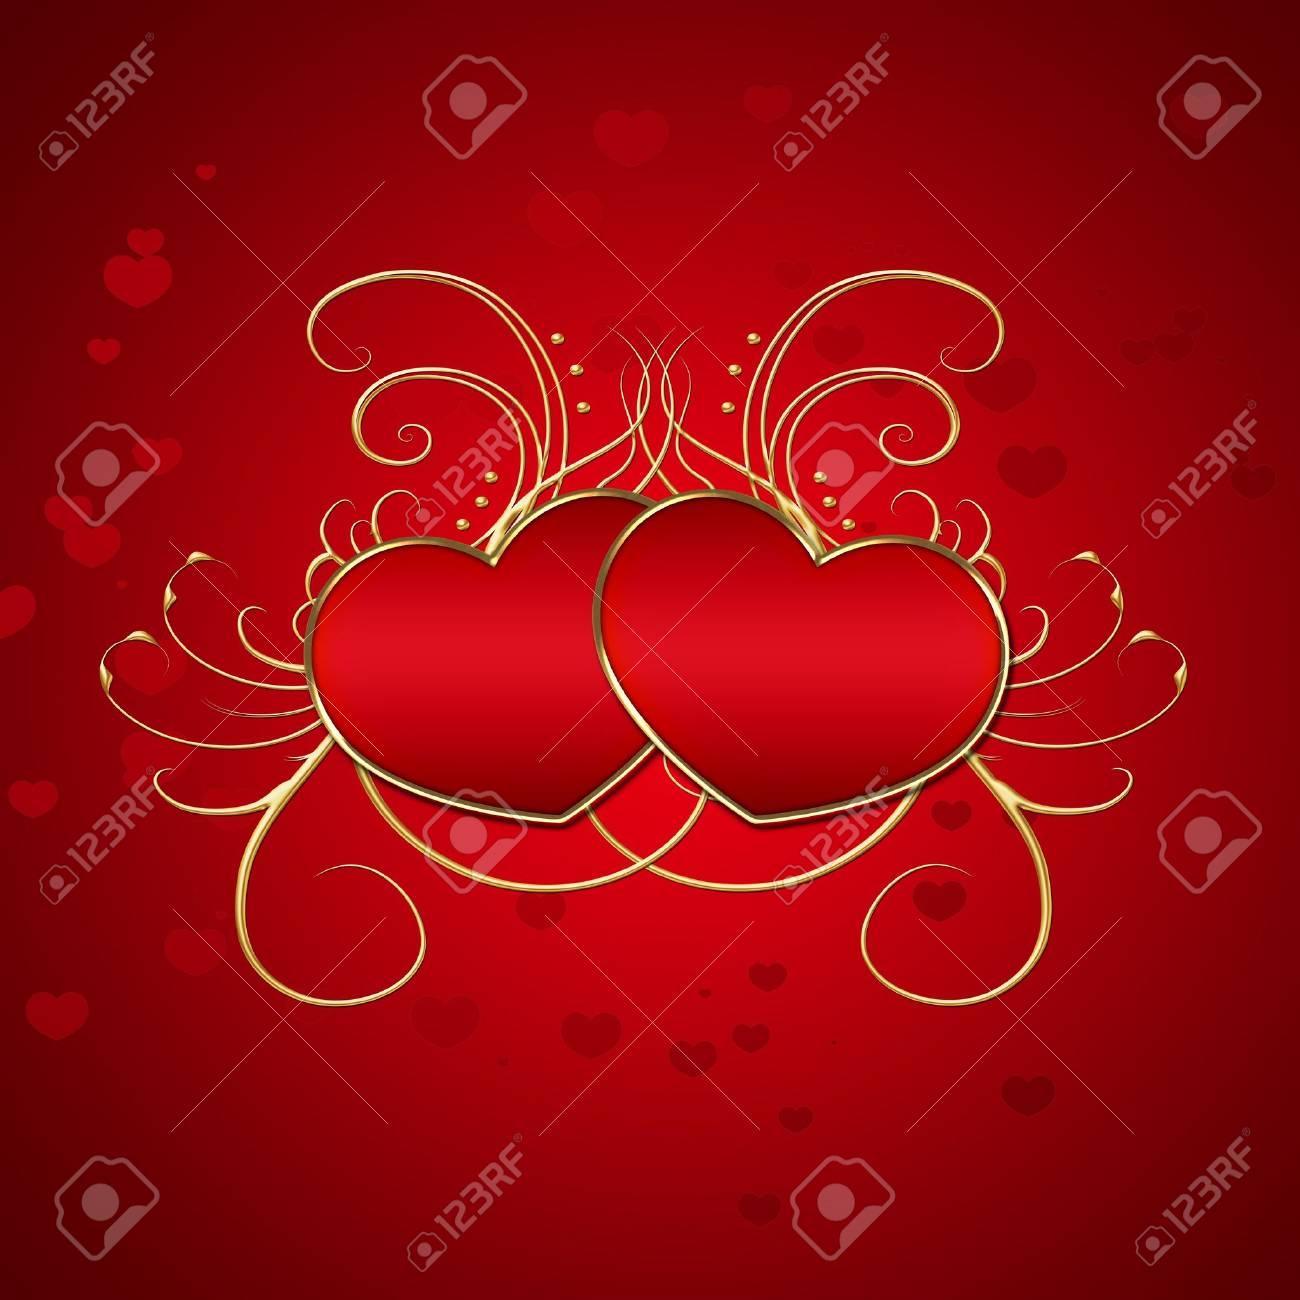 Elegant Red Hearts Illustration Stock Illustration - 14025977